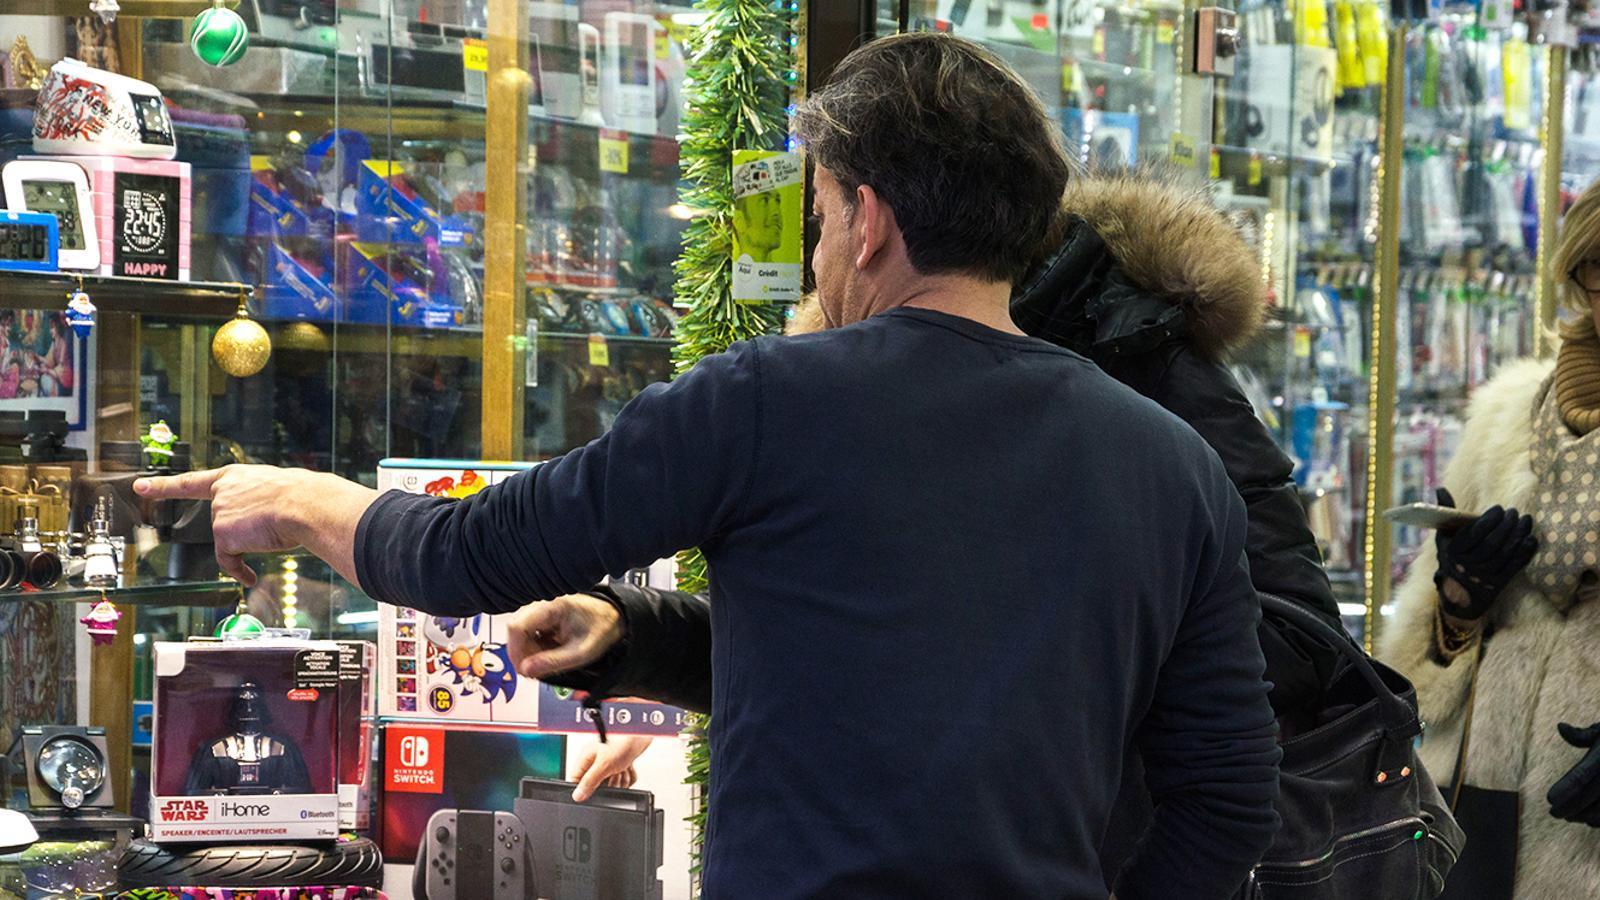 Visitants mirant aparadors de l'avinguda Meritxell. / ARXIU ANA